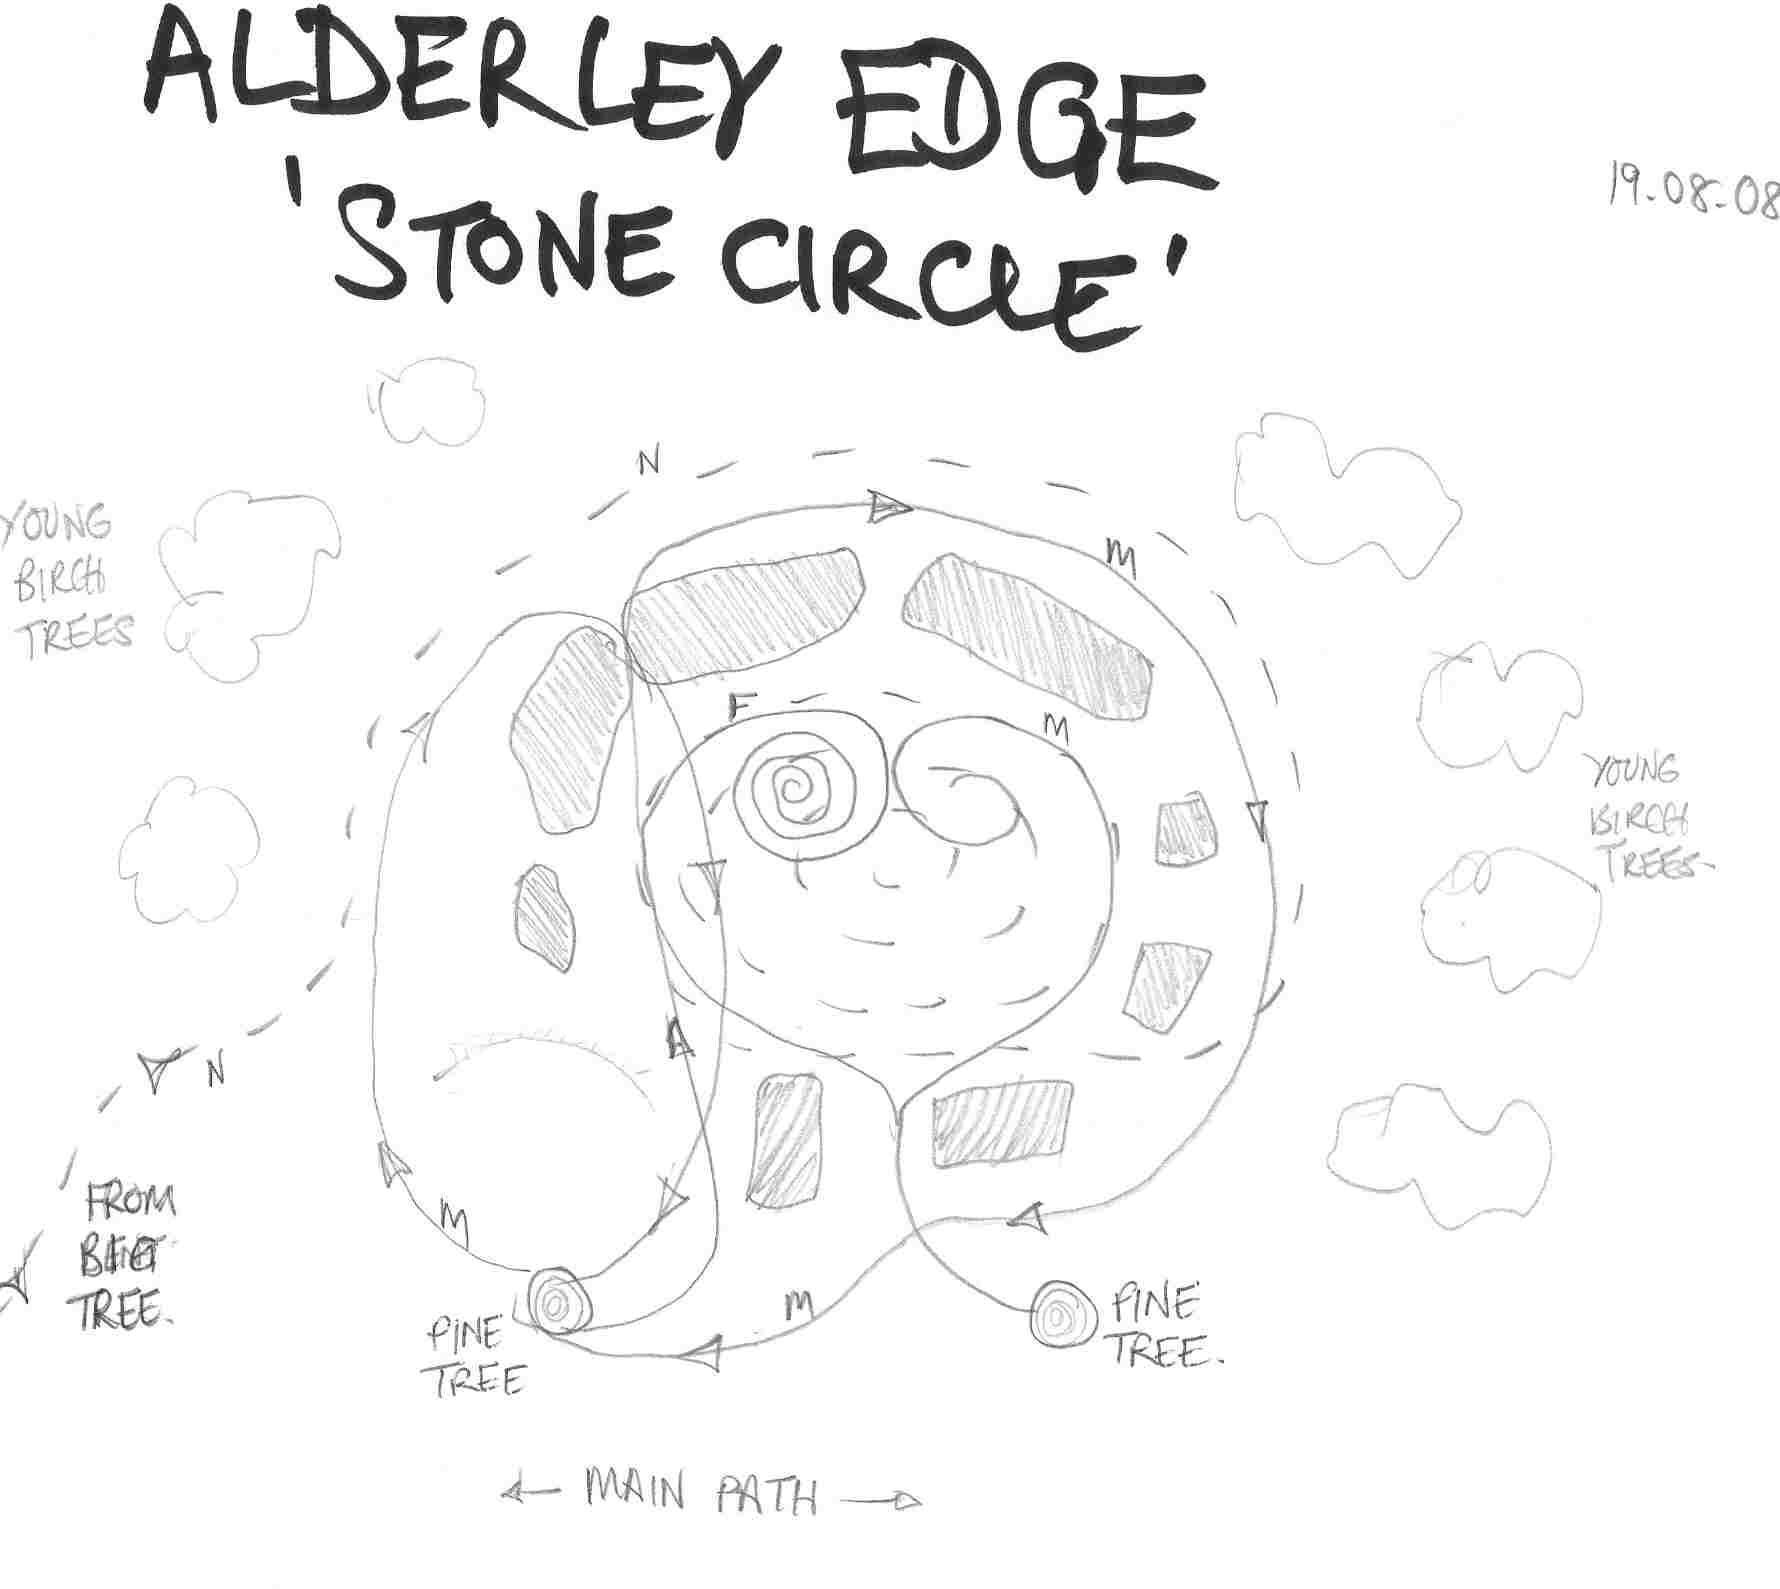 Alderley Edge folly circle